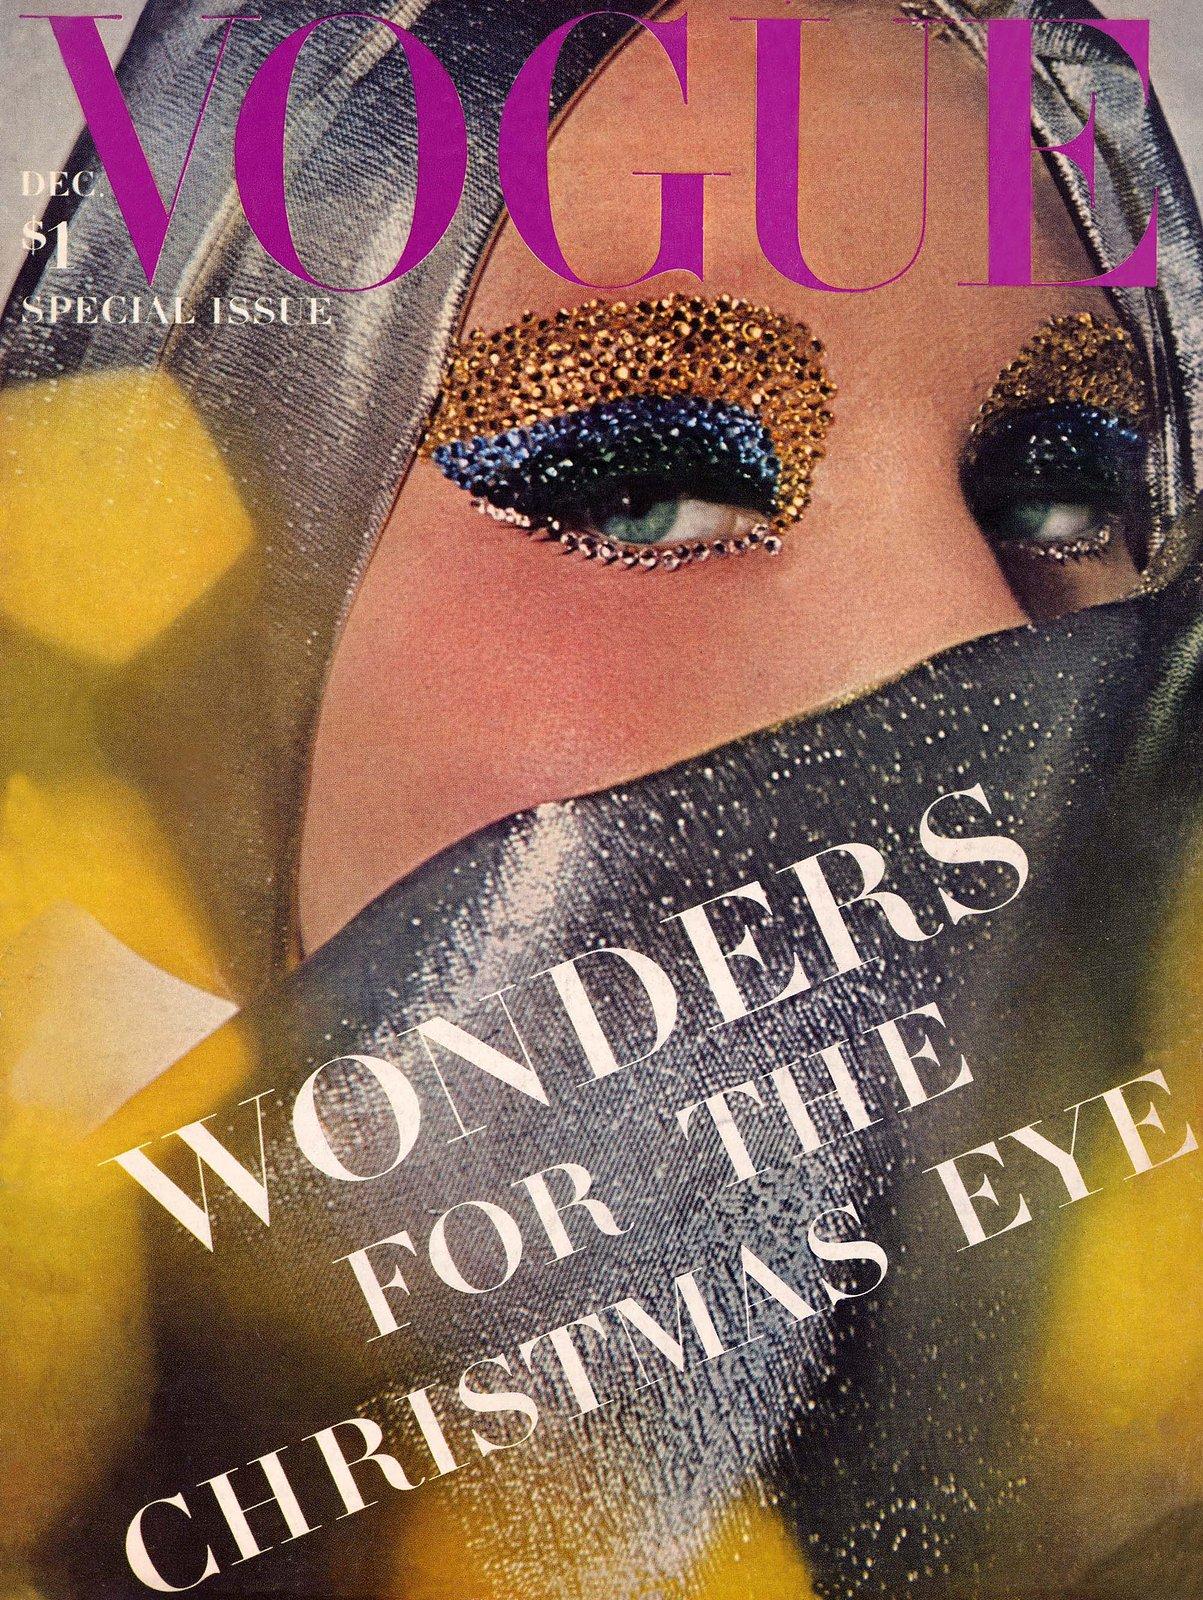 07-beauty-futurism-vogue